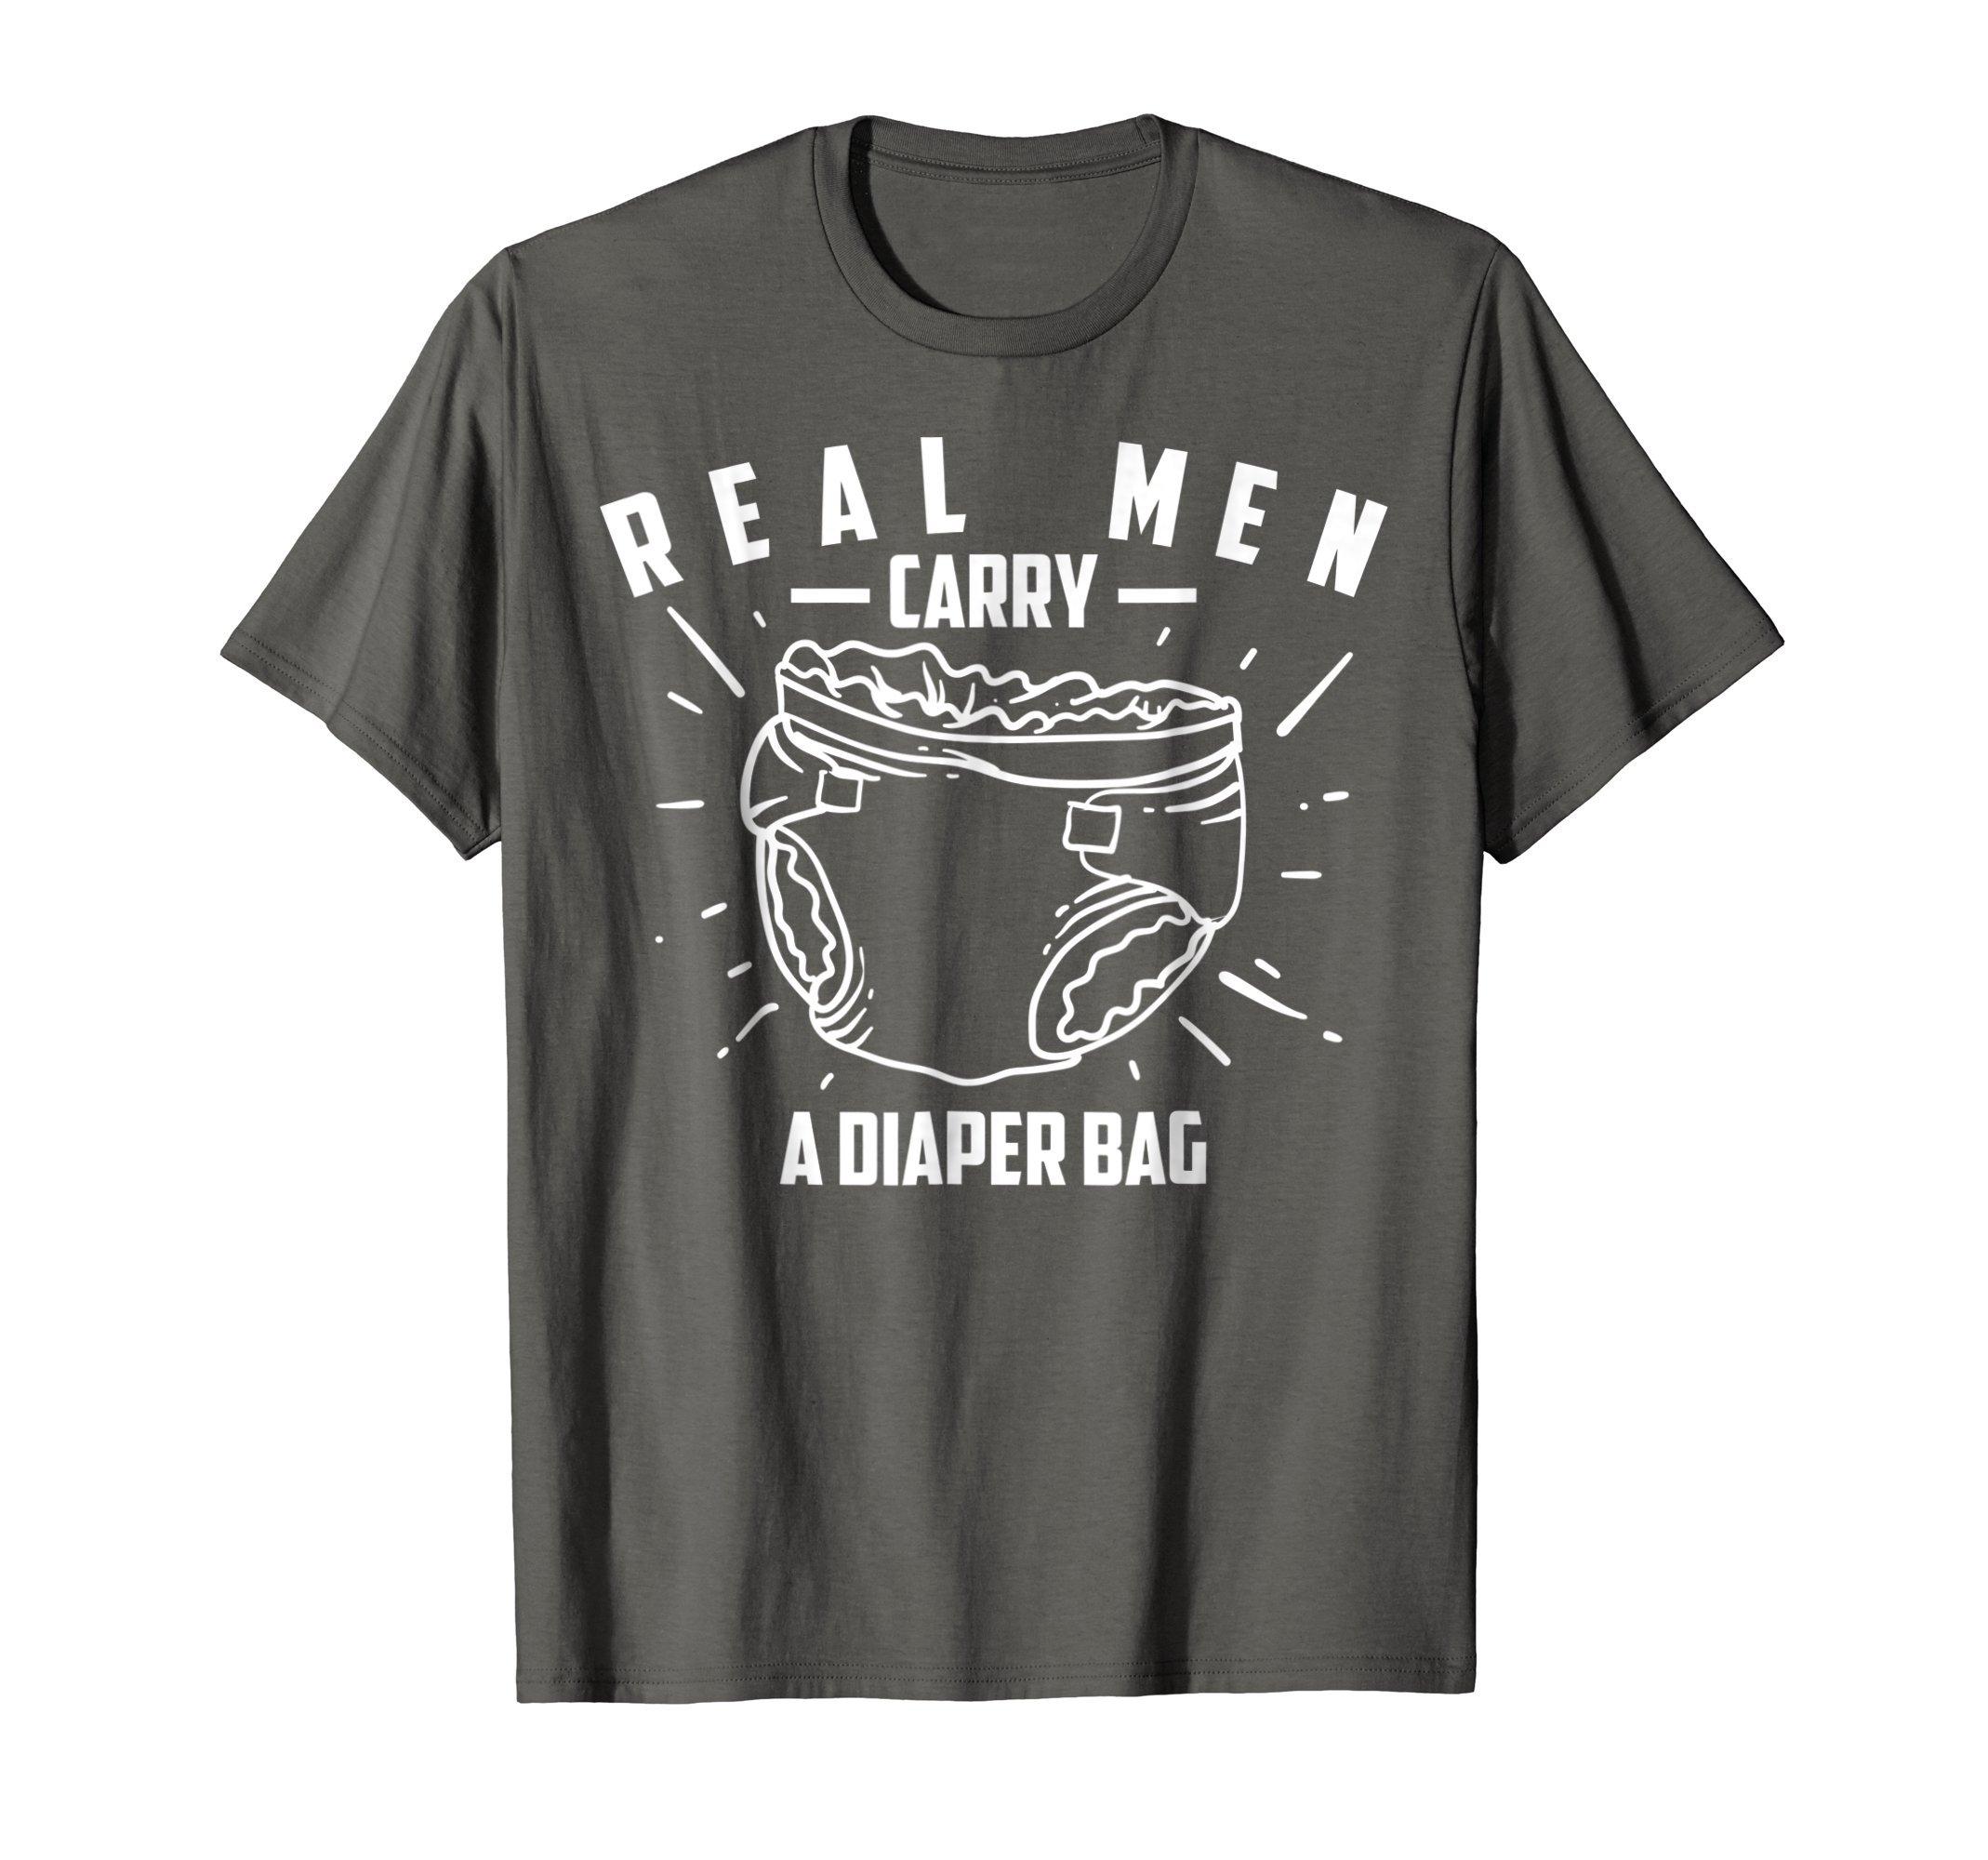 Real Men Carry A Diaper Bag Shirt | Cool True Dads Tee Gift